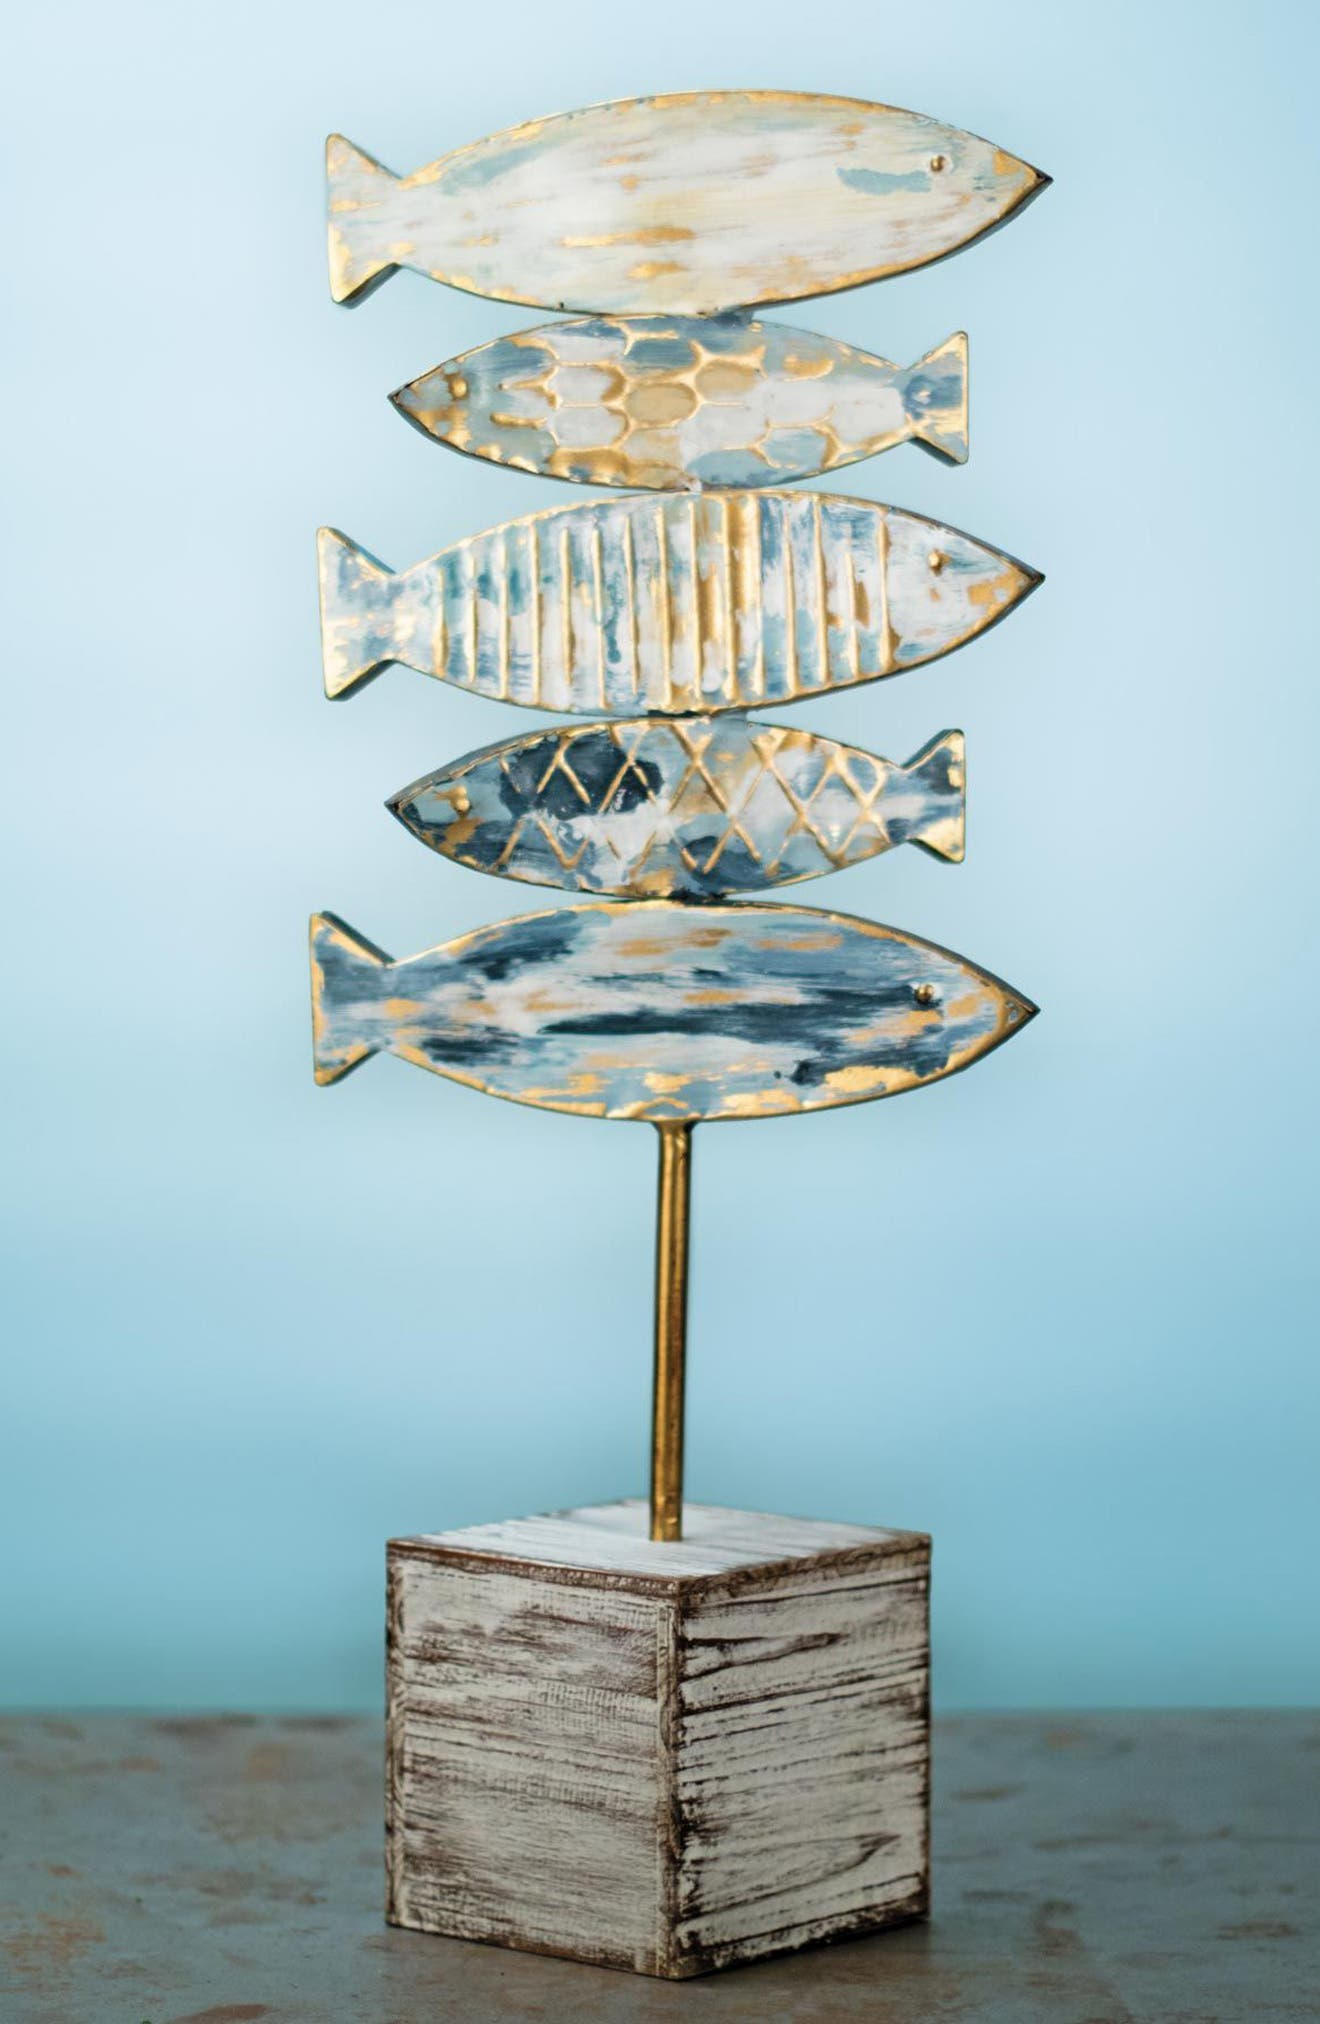 Fish Table Art,                             Alternate thumbnail 2, color,                             WOOD/ METAL